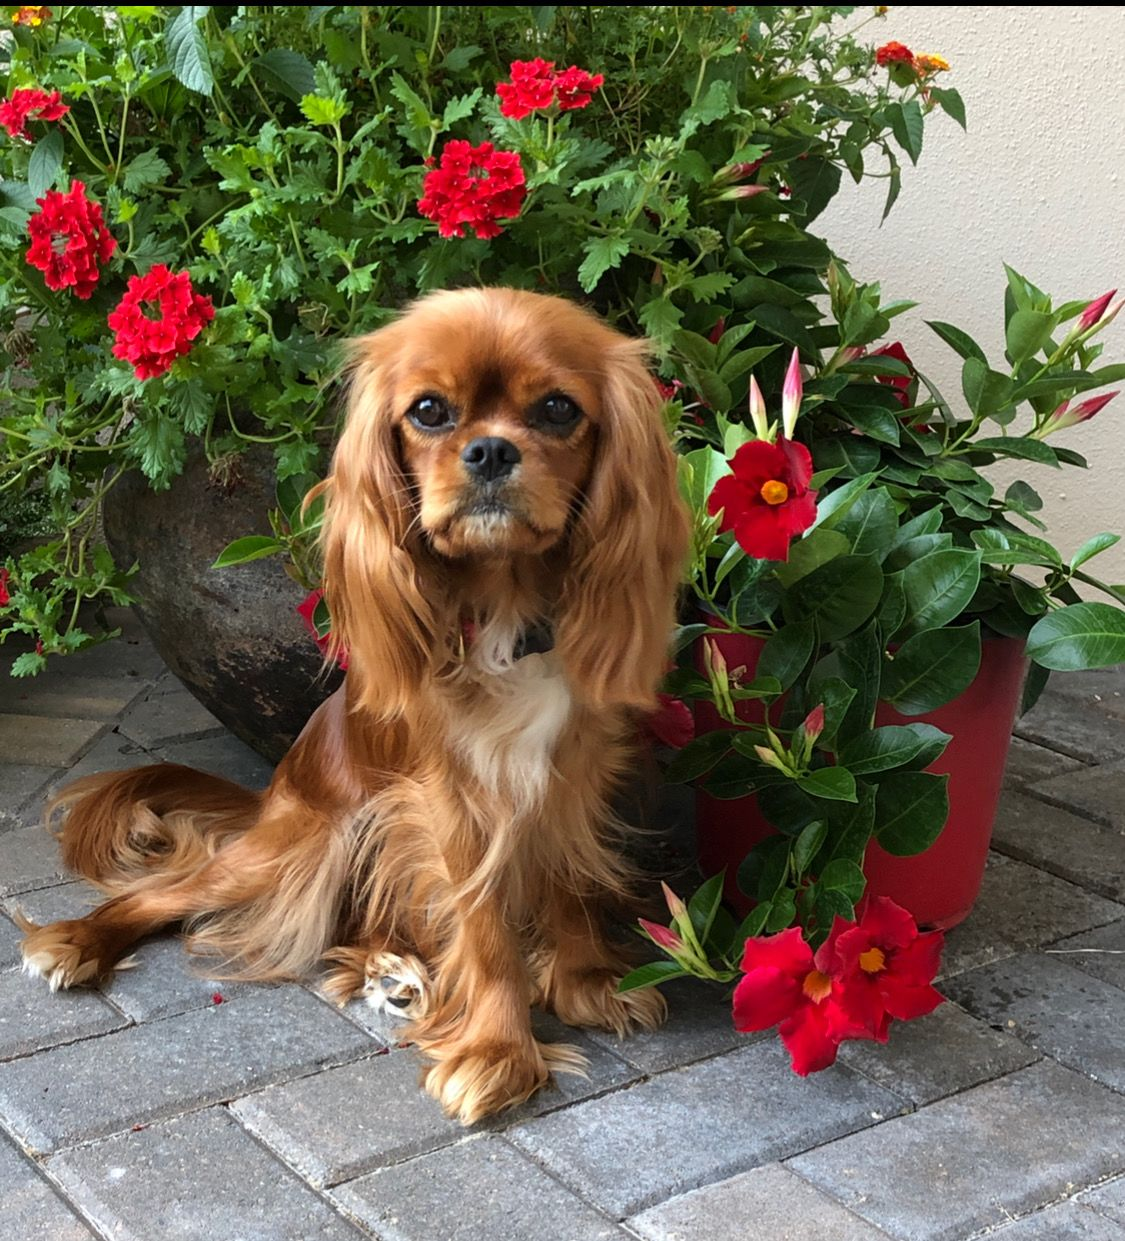 Ruby Cavalier King Charles Spaniel King Charles Cavalier Spaniel Puppy Cavalier King Charles Dog Cavalier King Charles